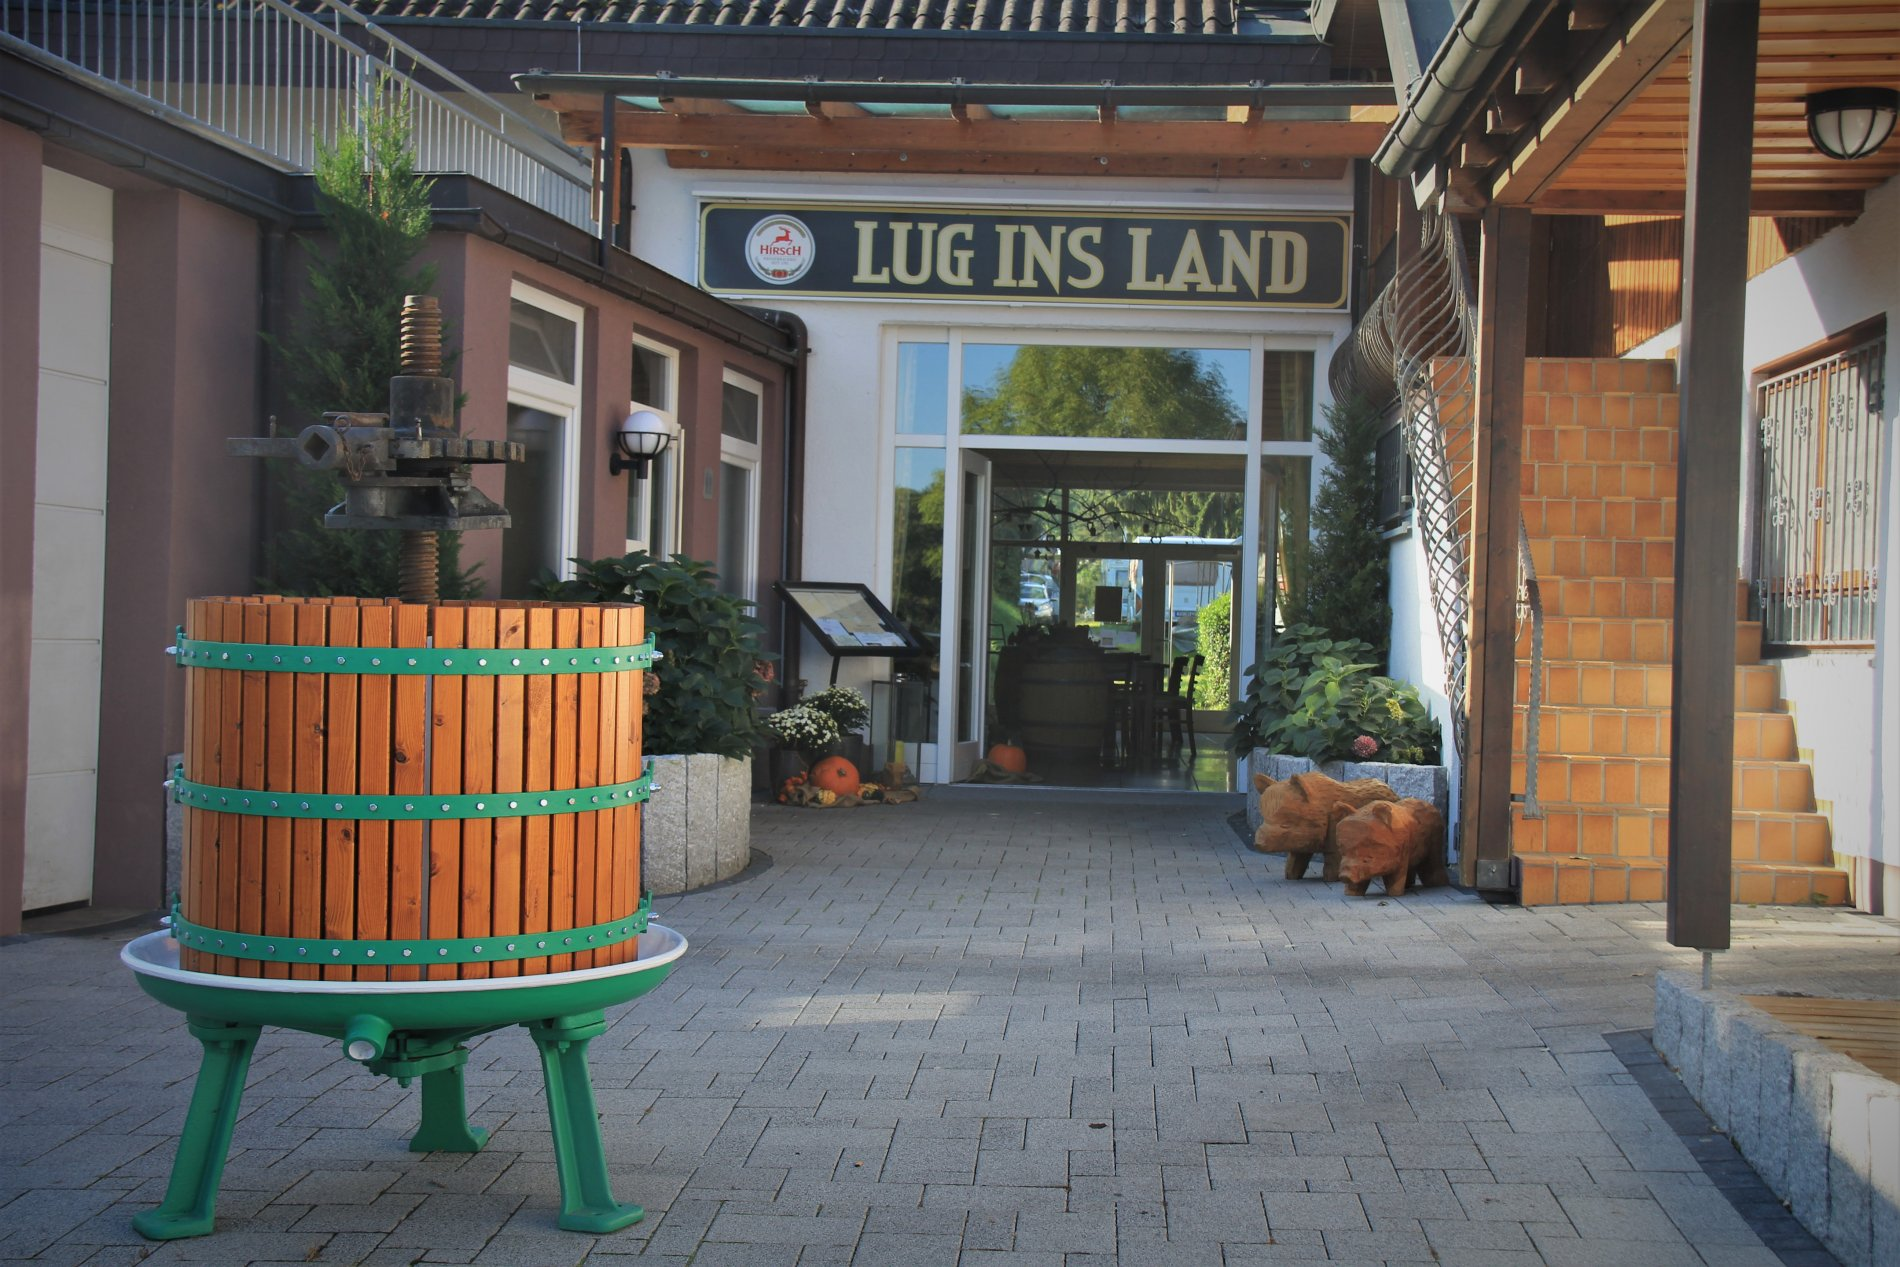 Eingang zum Restaurant Lug ins Land